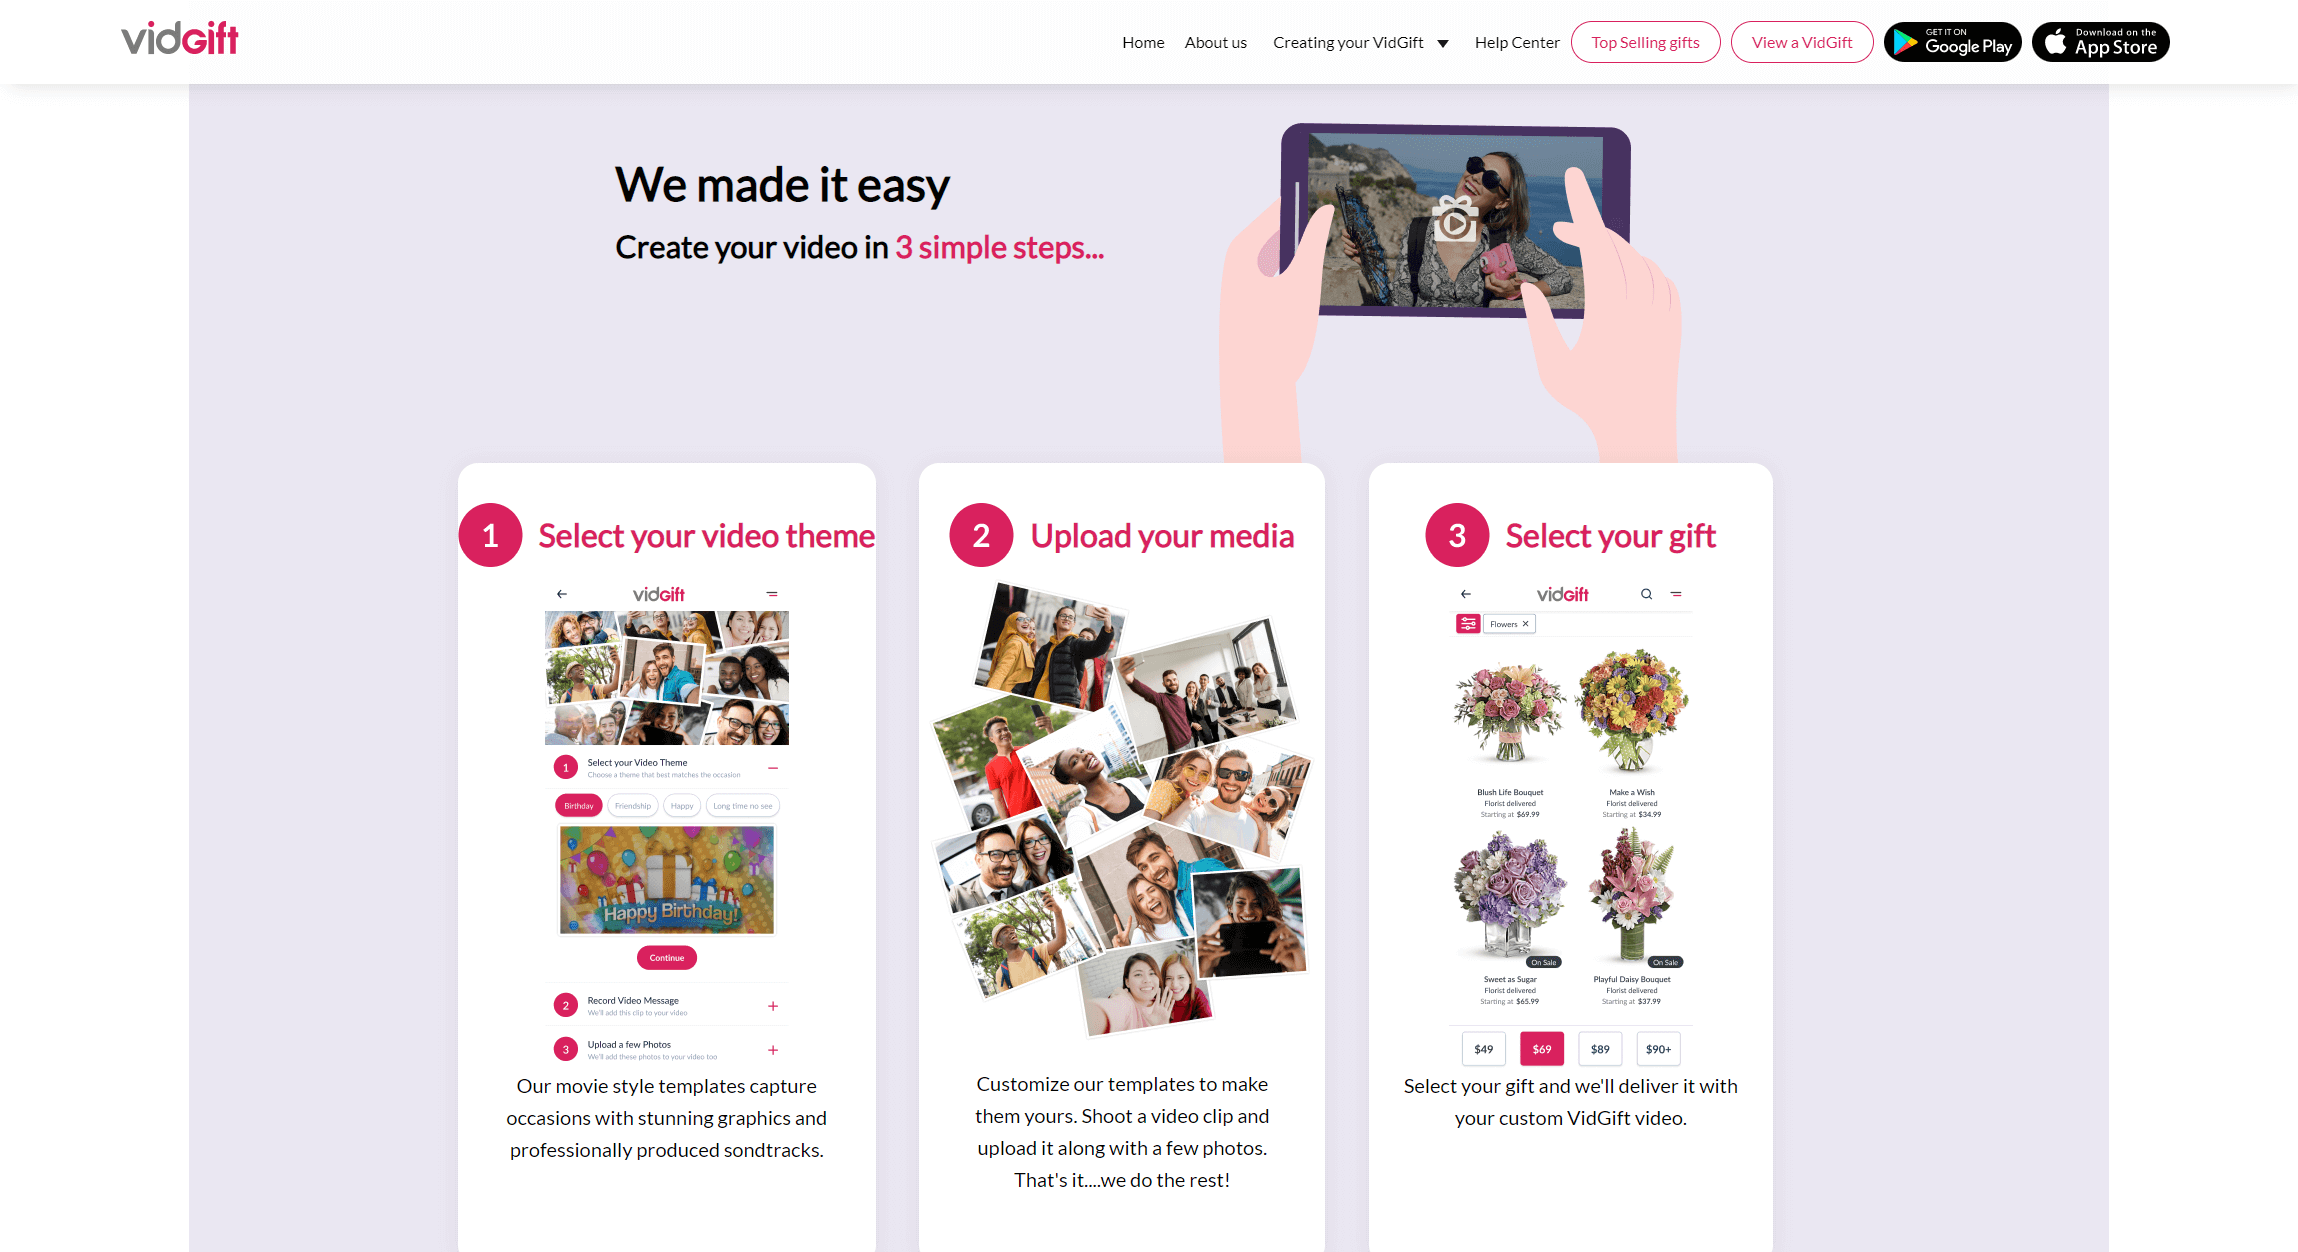 vidgift.com-4